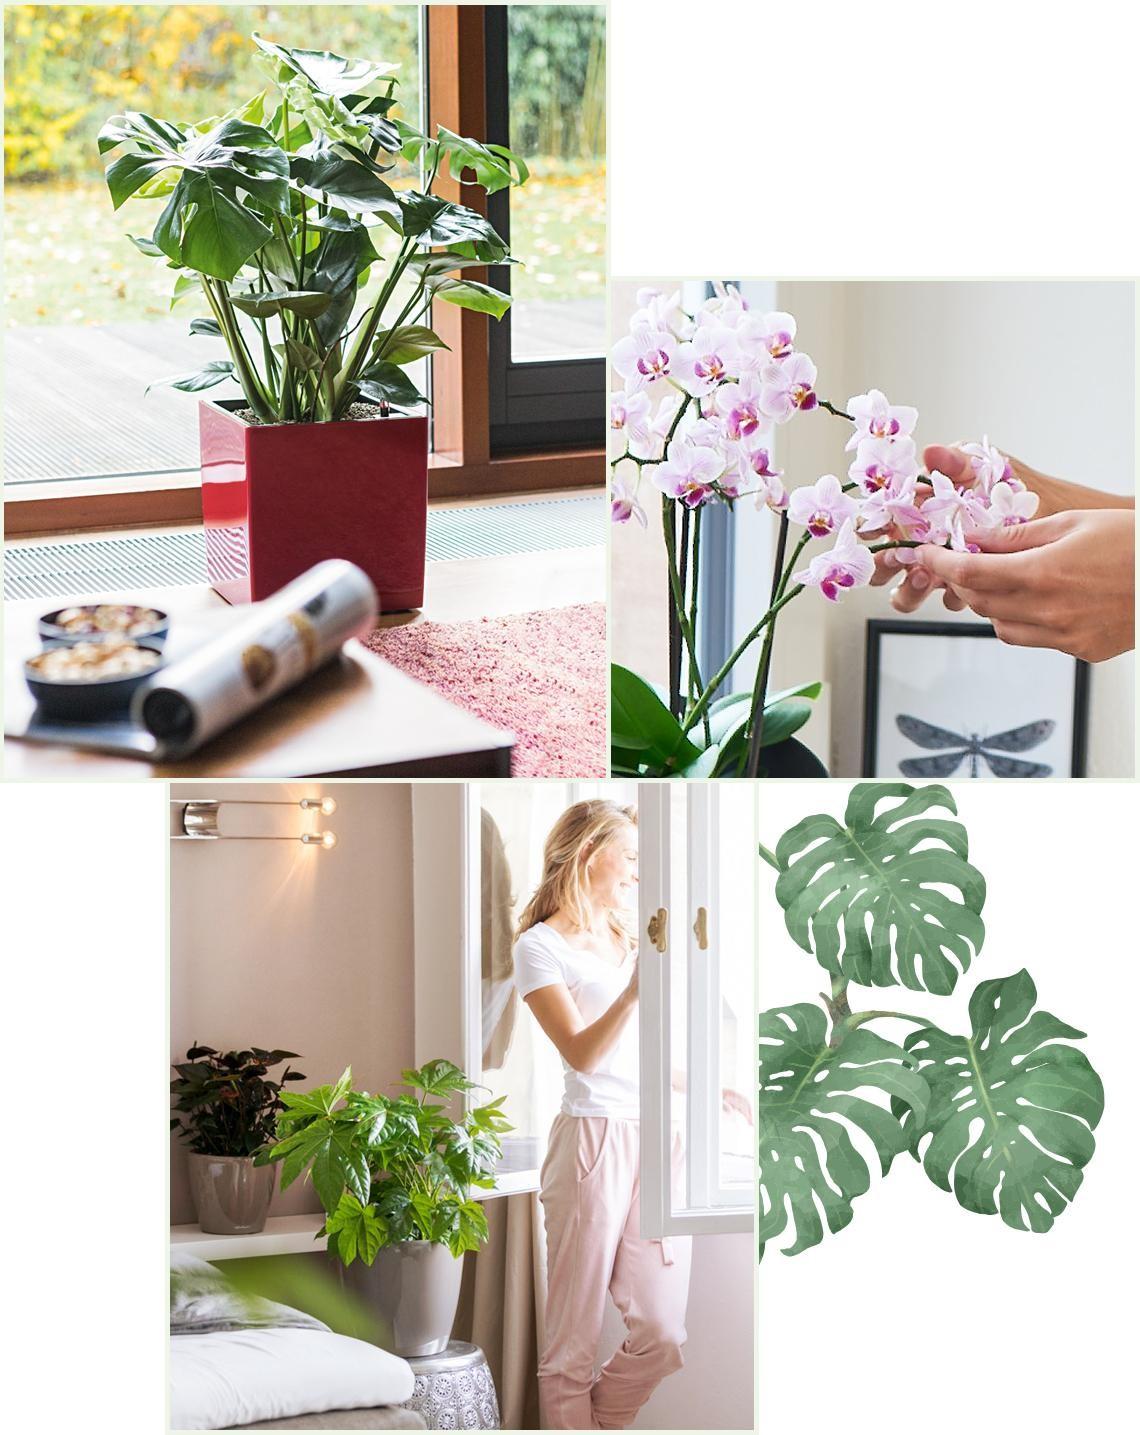 le_tw-indoorplants_abstauben_1-1